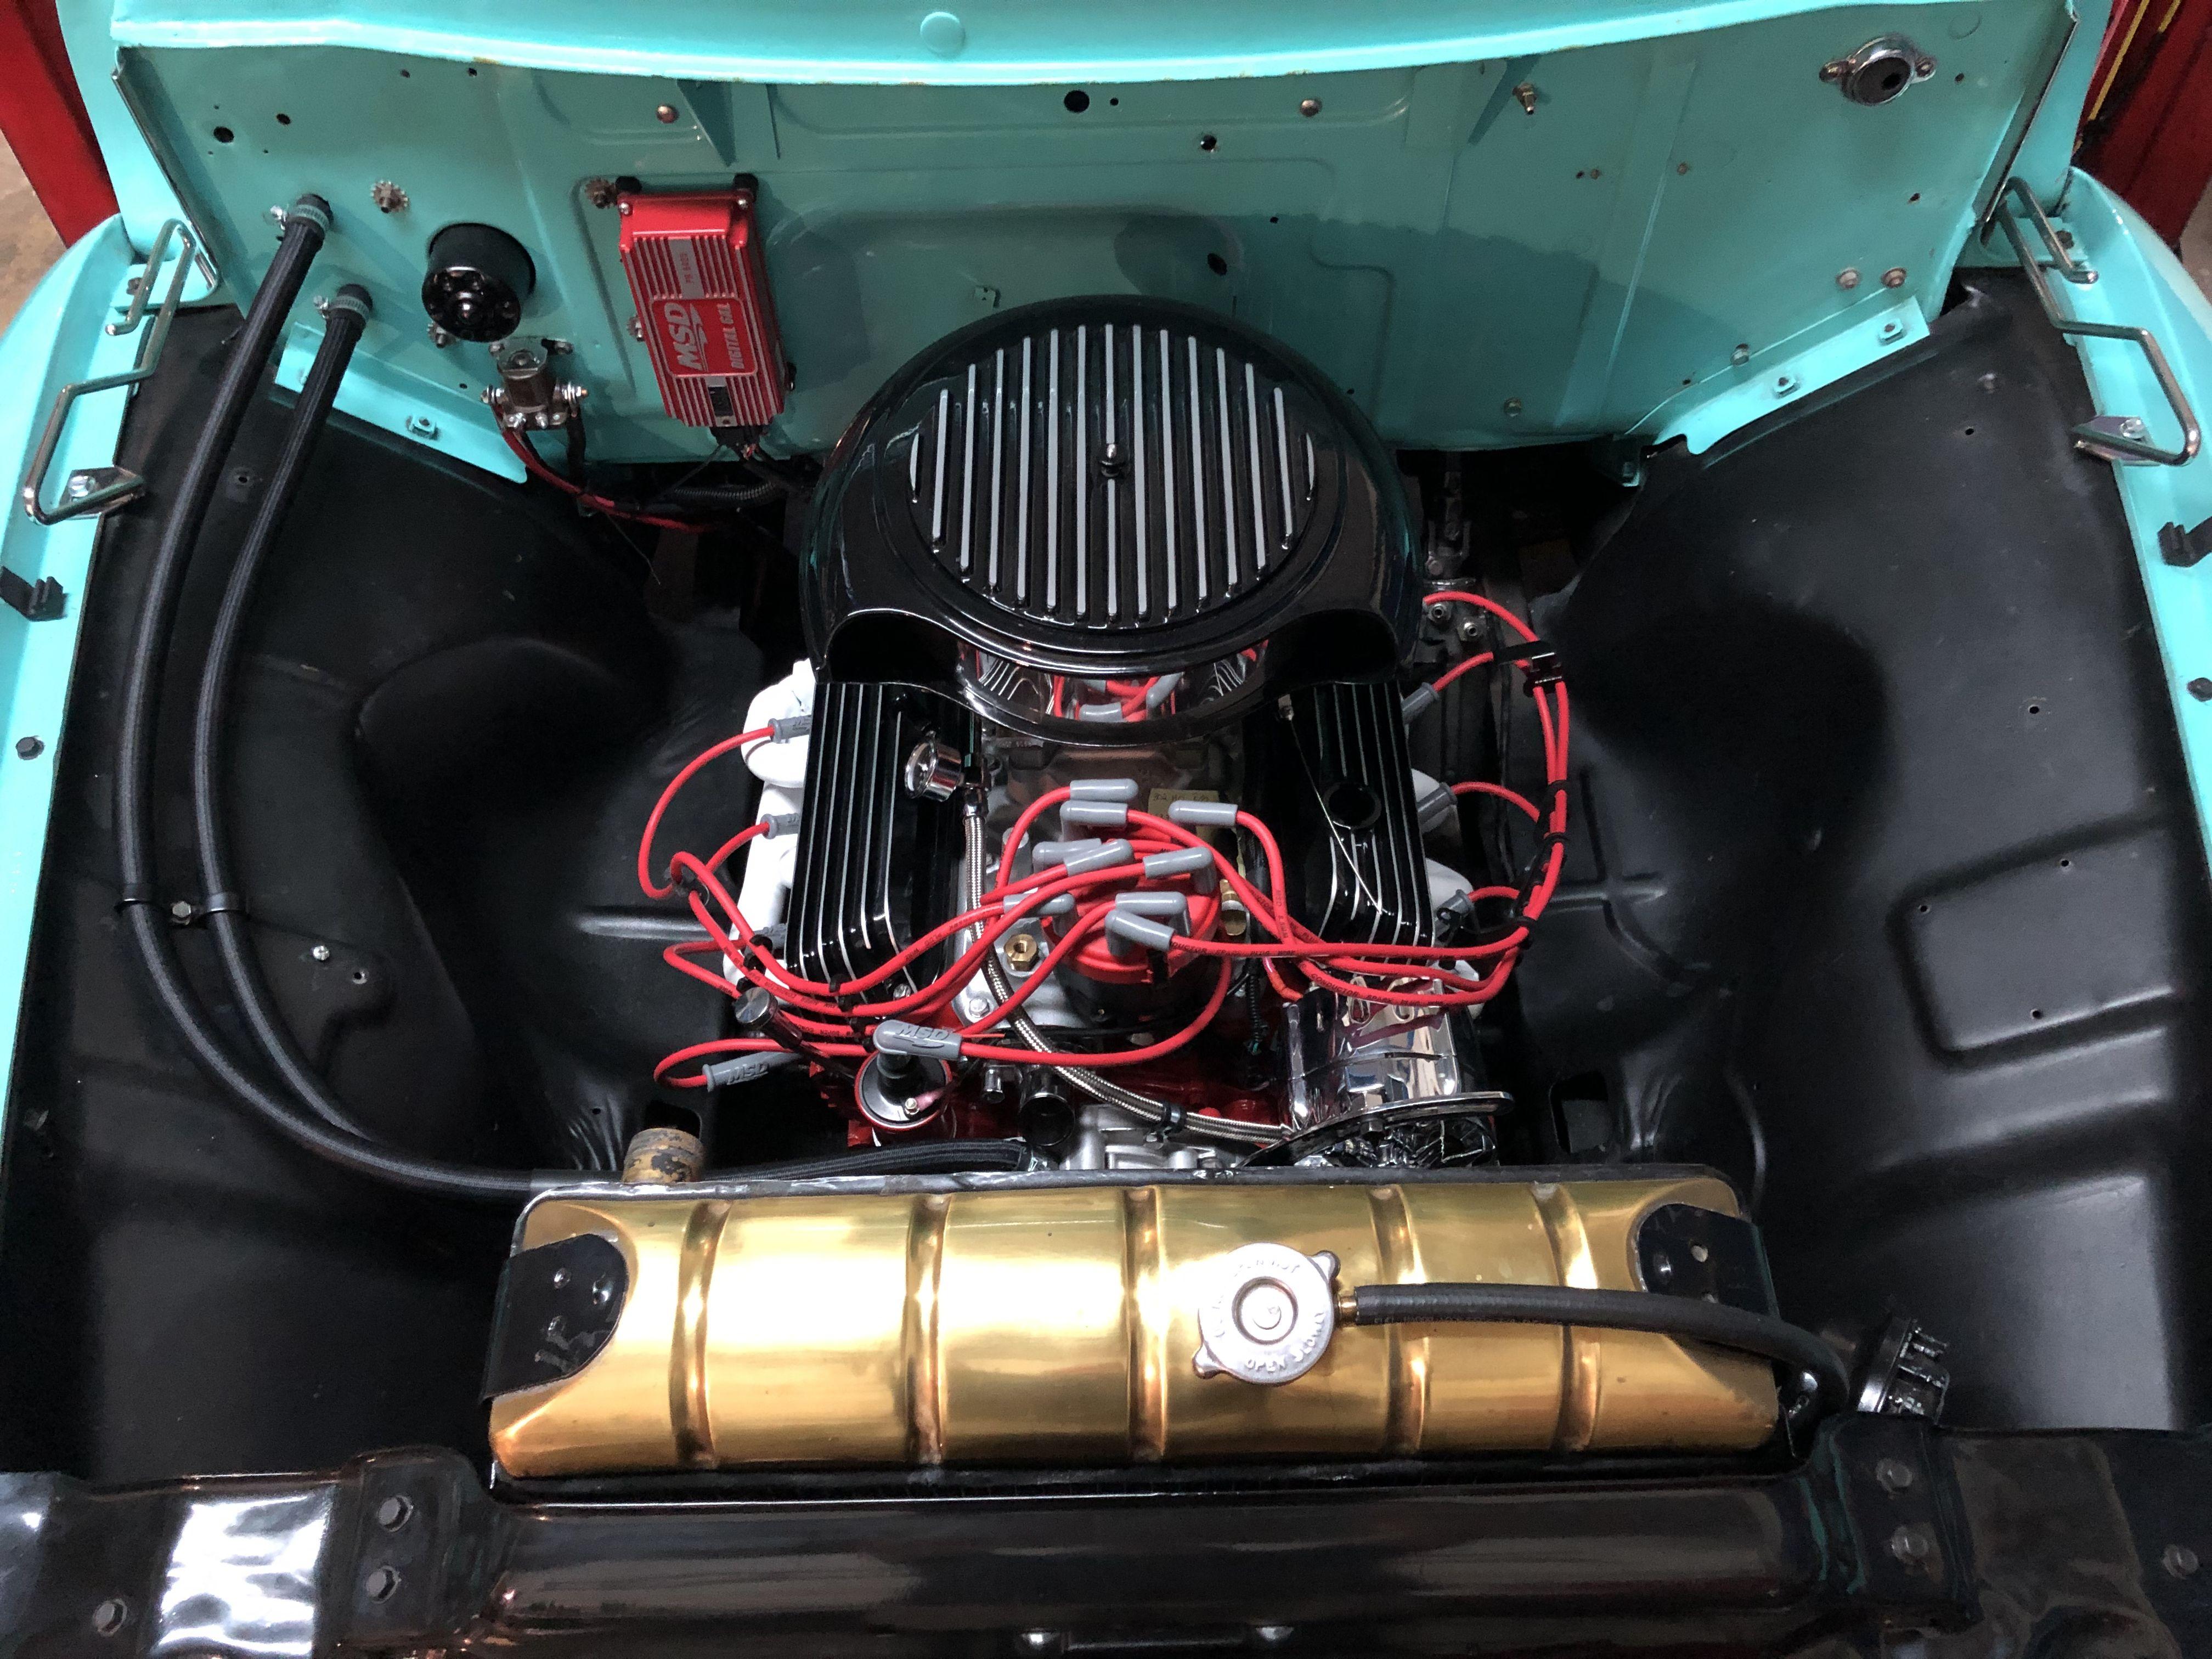 Pin By Jerry Gonzalez On 1955 F 100 Build 1956 Ford Truck Classic Cars Trucks Hot Rod Trucks